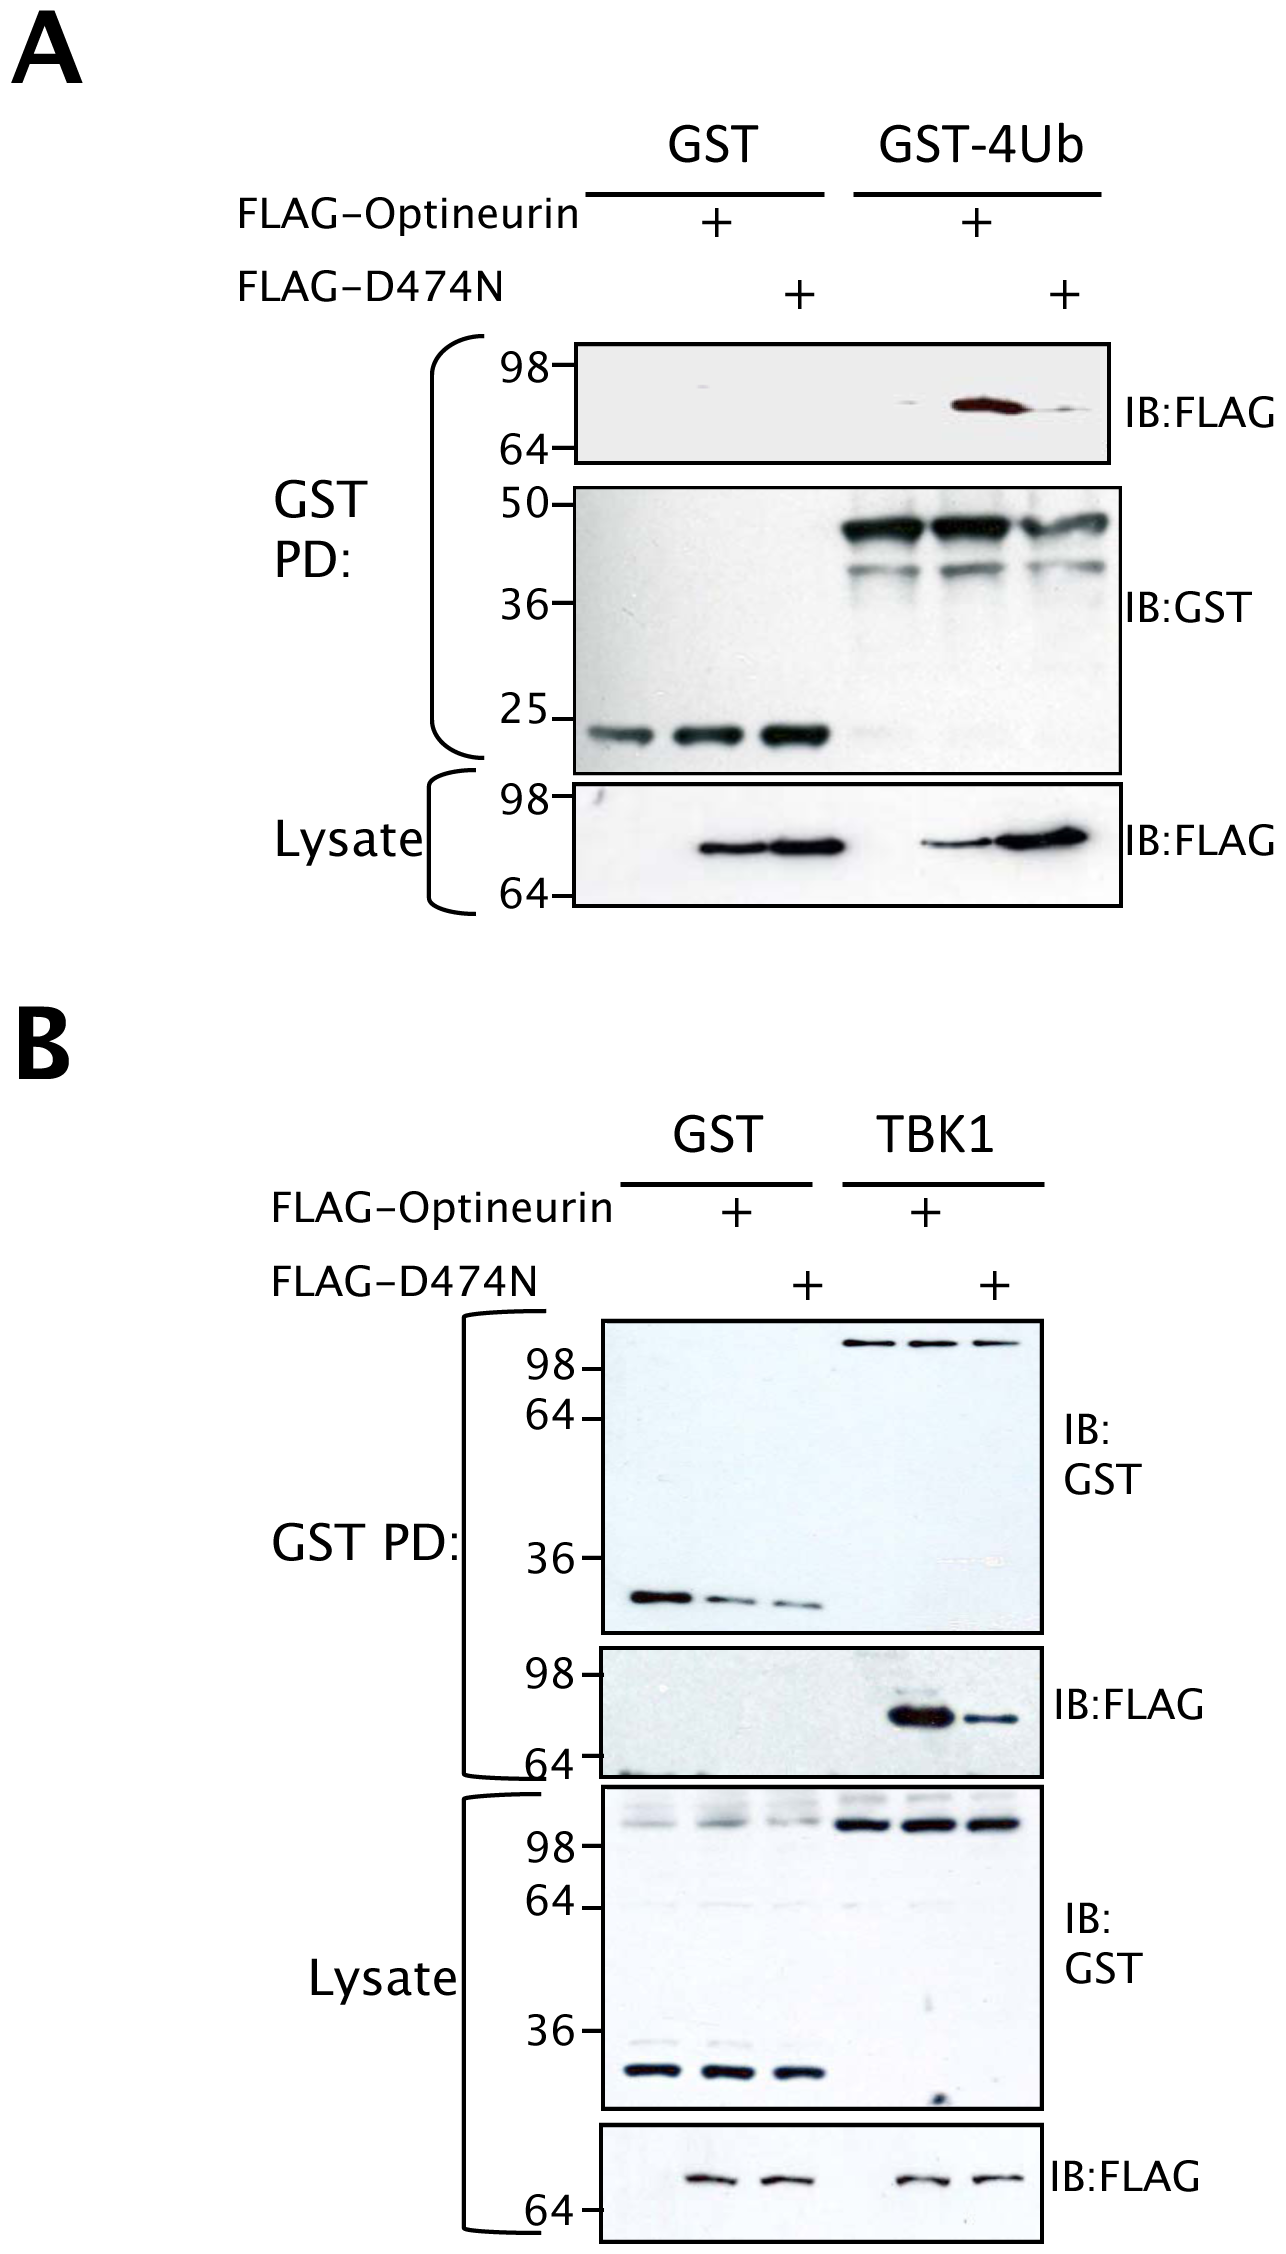 Ubiquitin binding motif of optineurin is required for TBK1 binding.